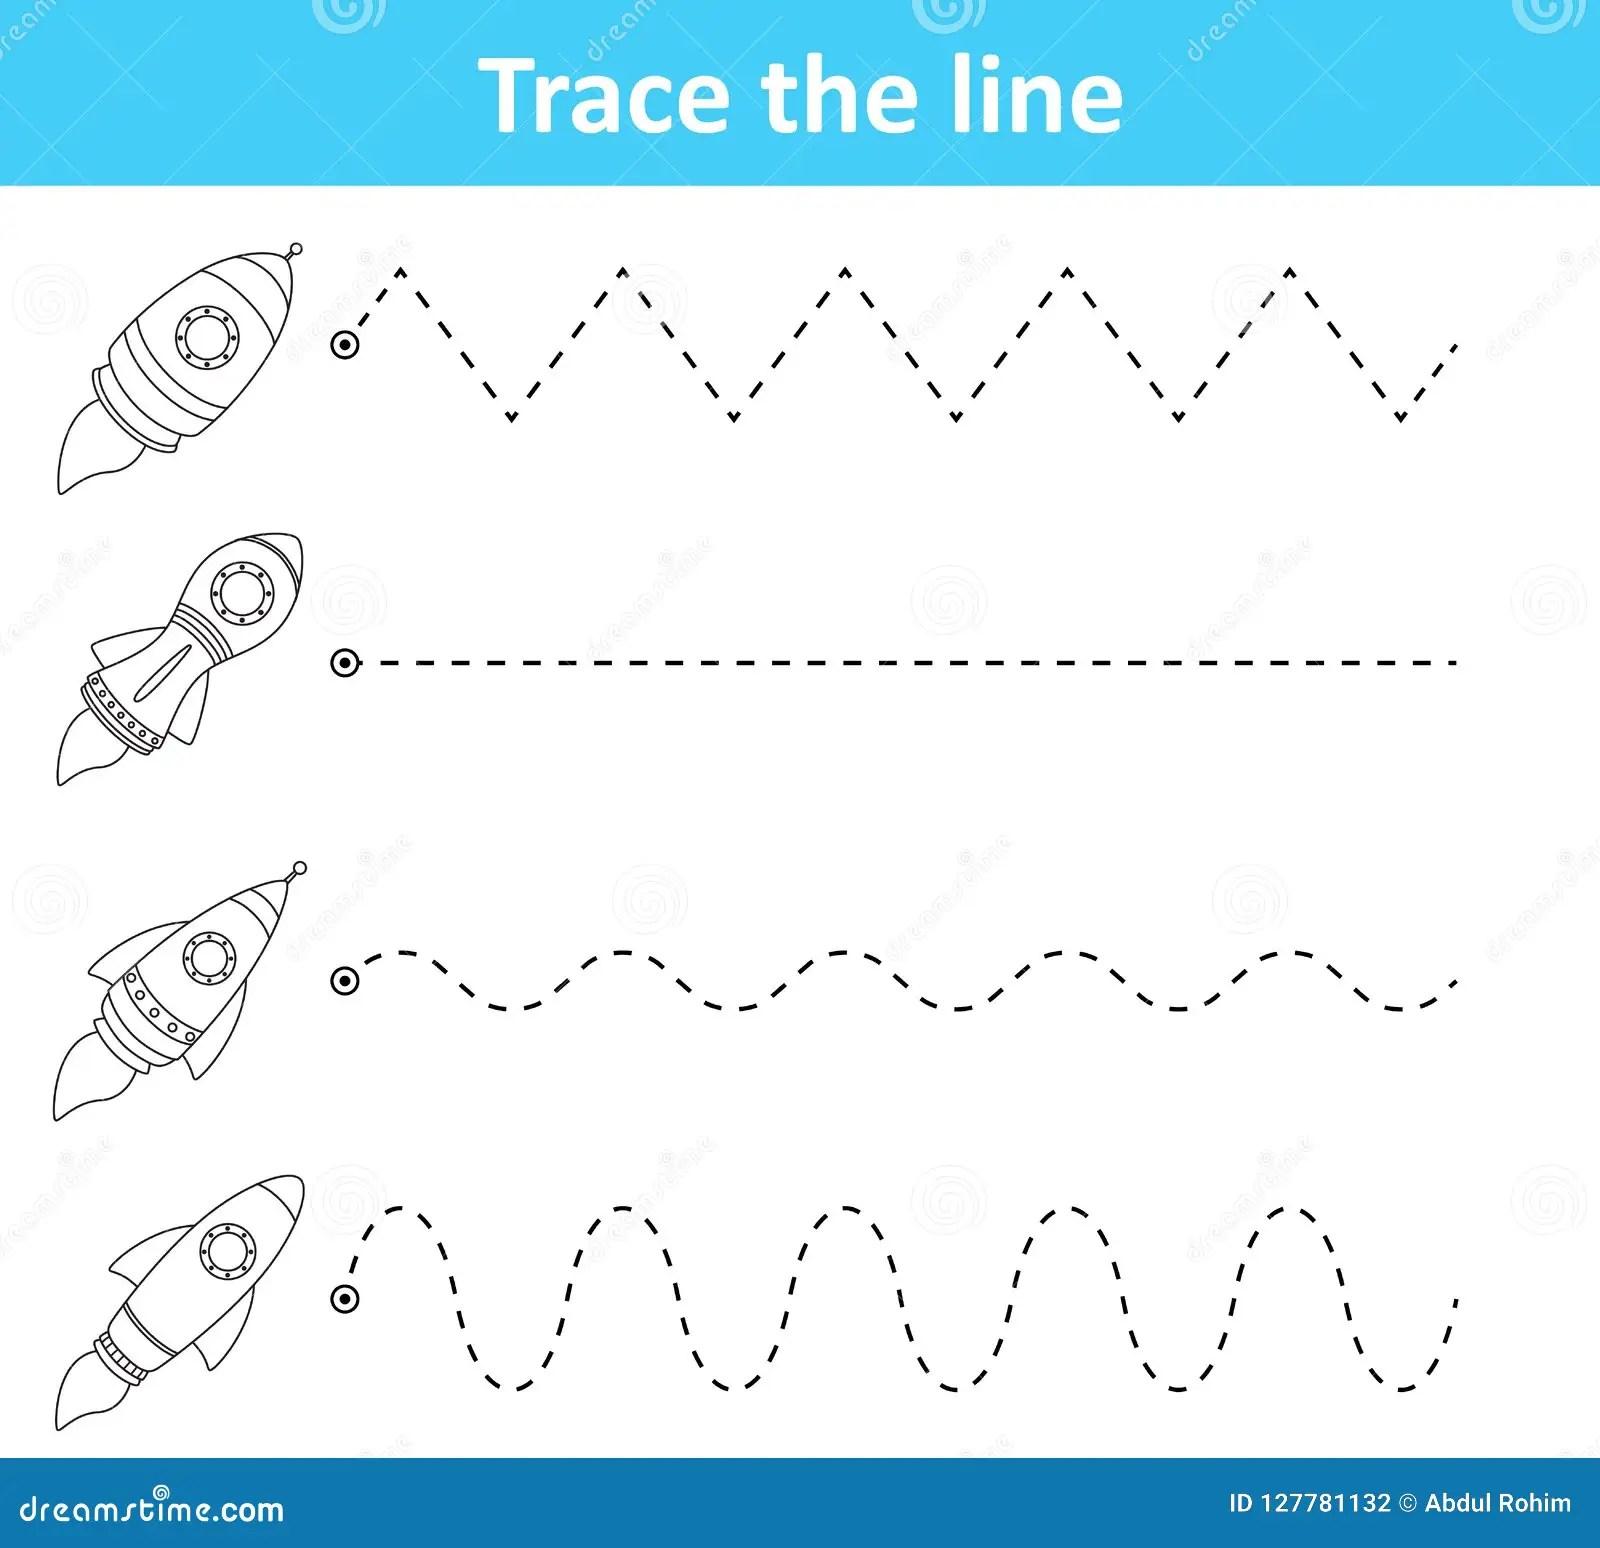 Trace Line Worksheet For Preschool Kids With Rockets Stock